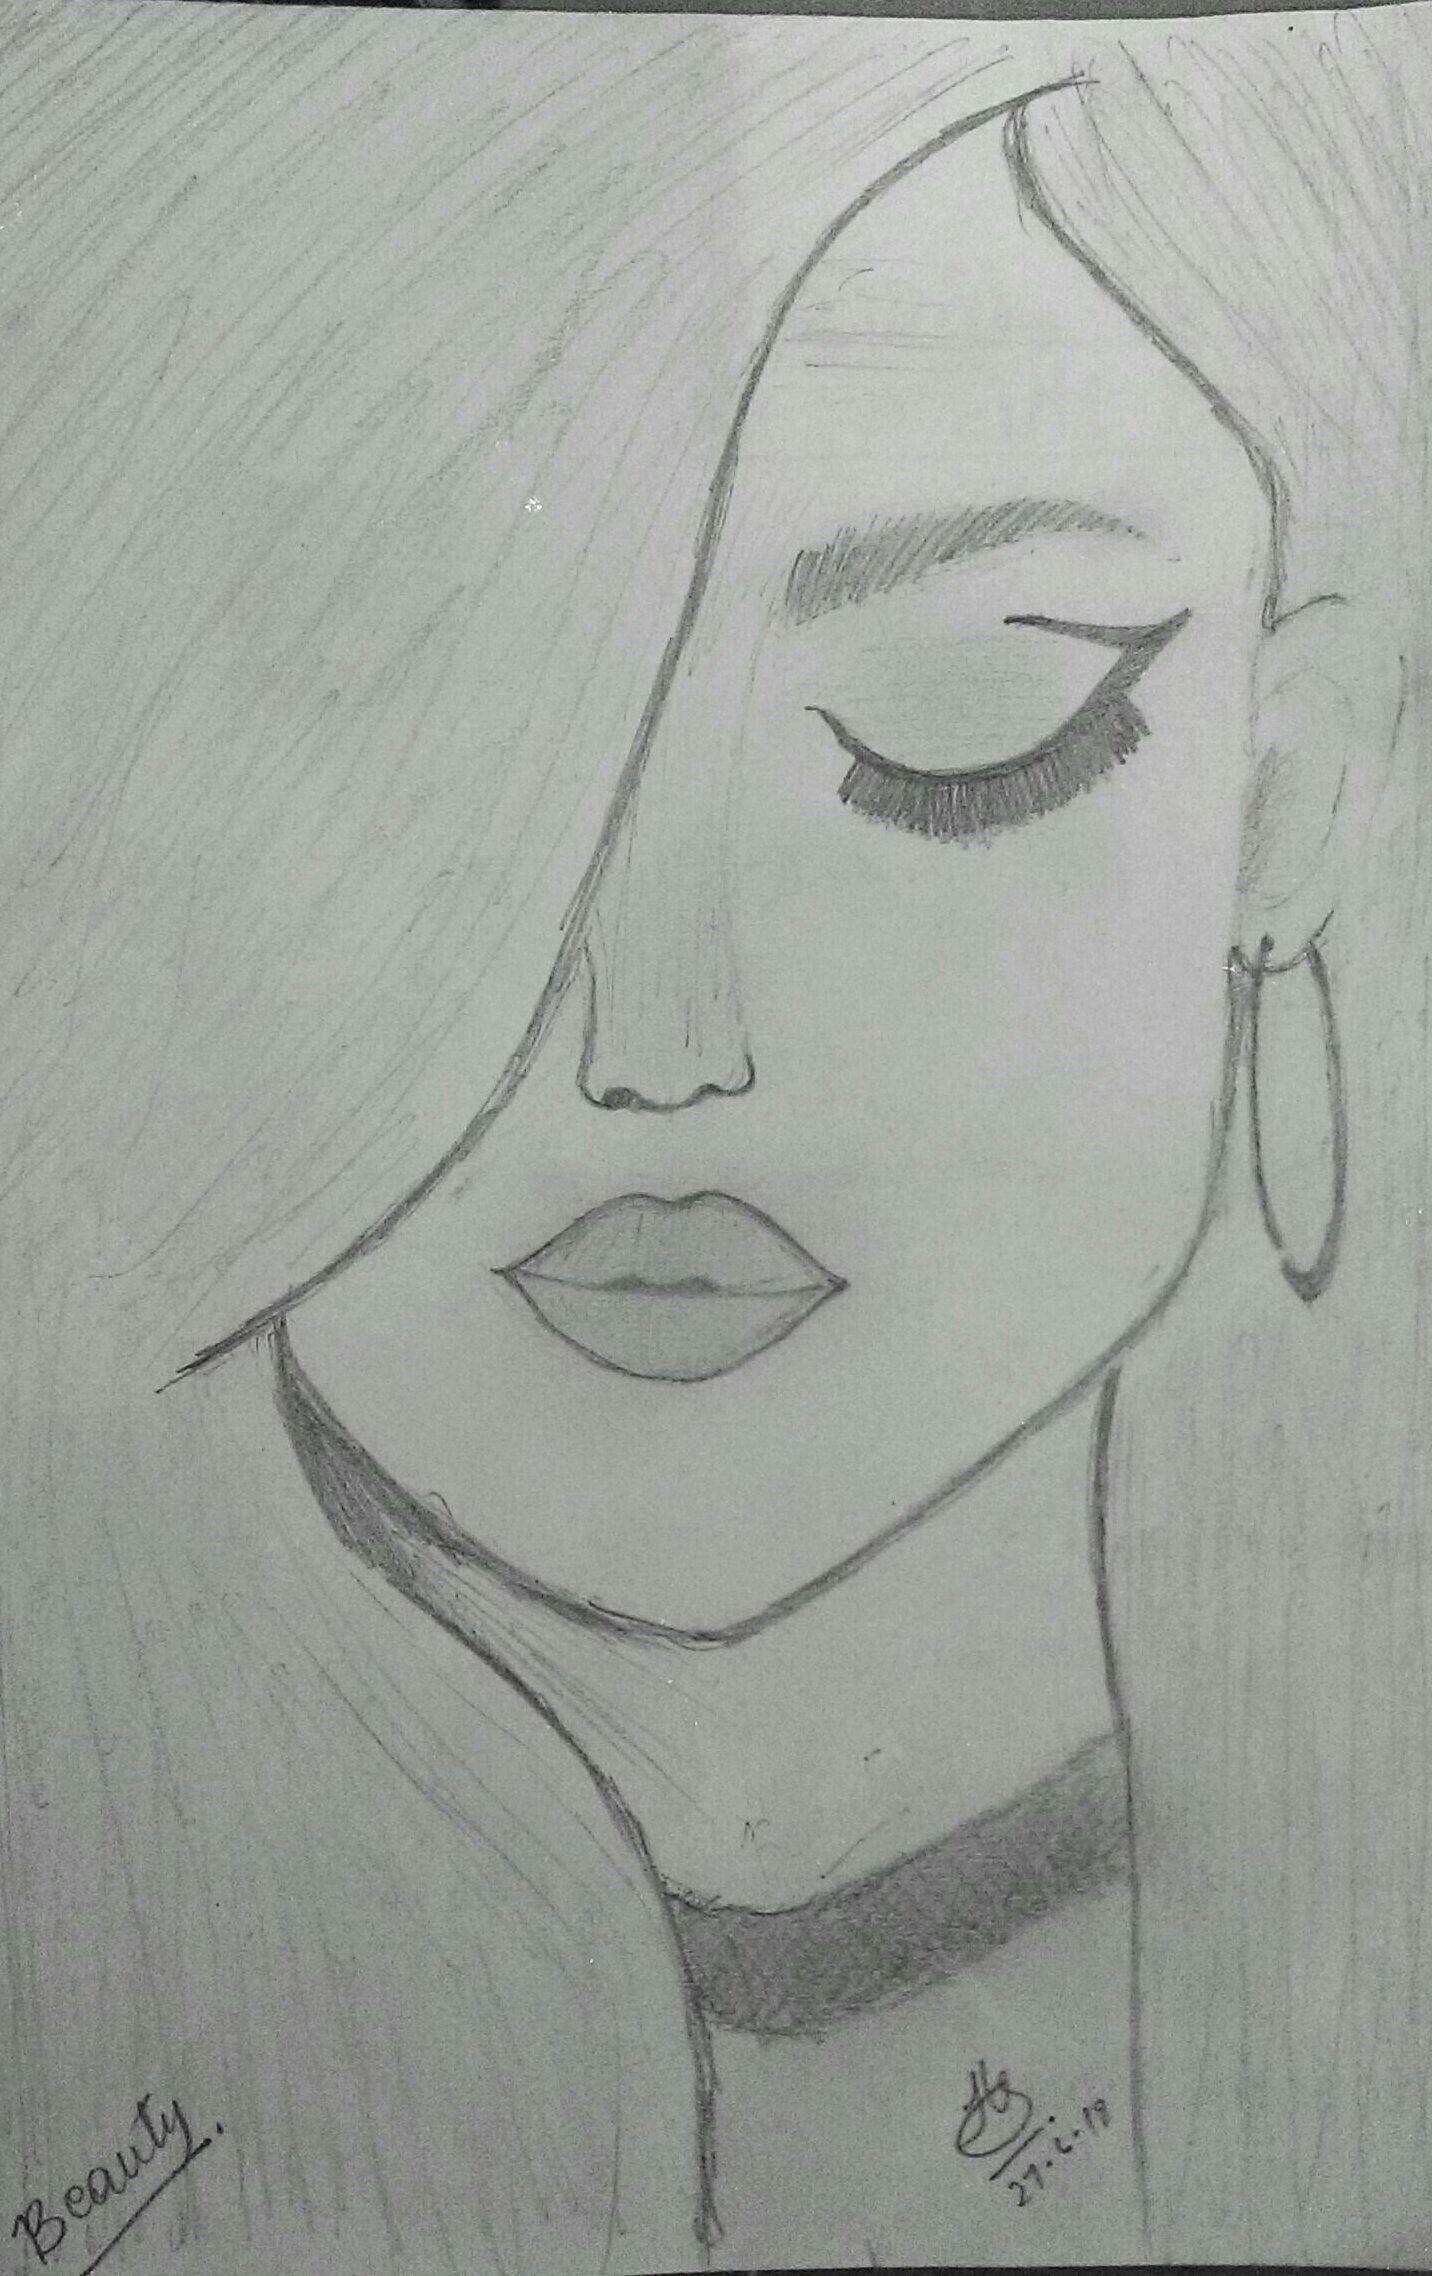 Pencil Drawings You Know It Kinda Looks Like Selena Gomez Artdrawingssketchespenci Dibujos Geniales De Arte Bocetos Faciles De Dibujar Dibujos Tristes A Lapiz